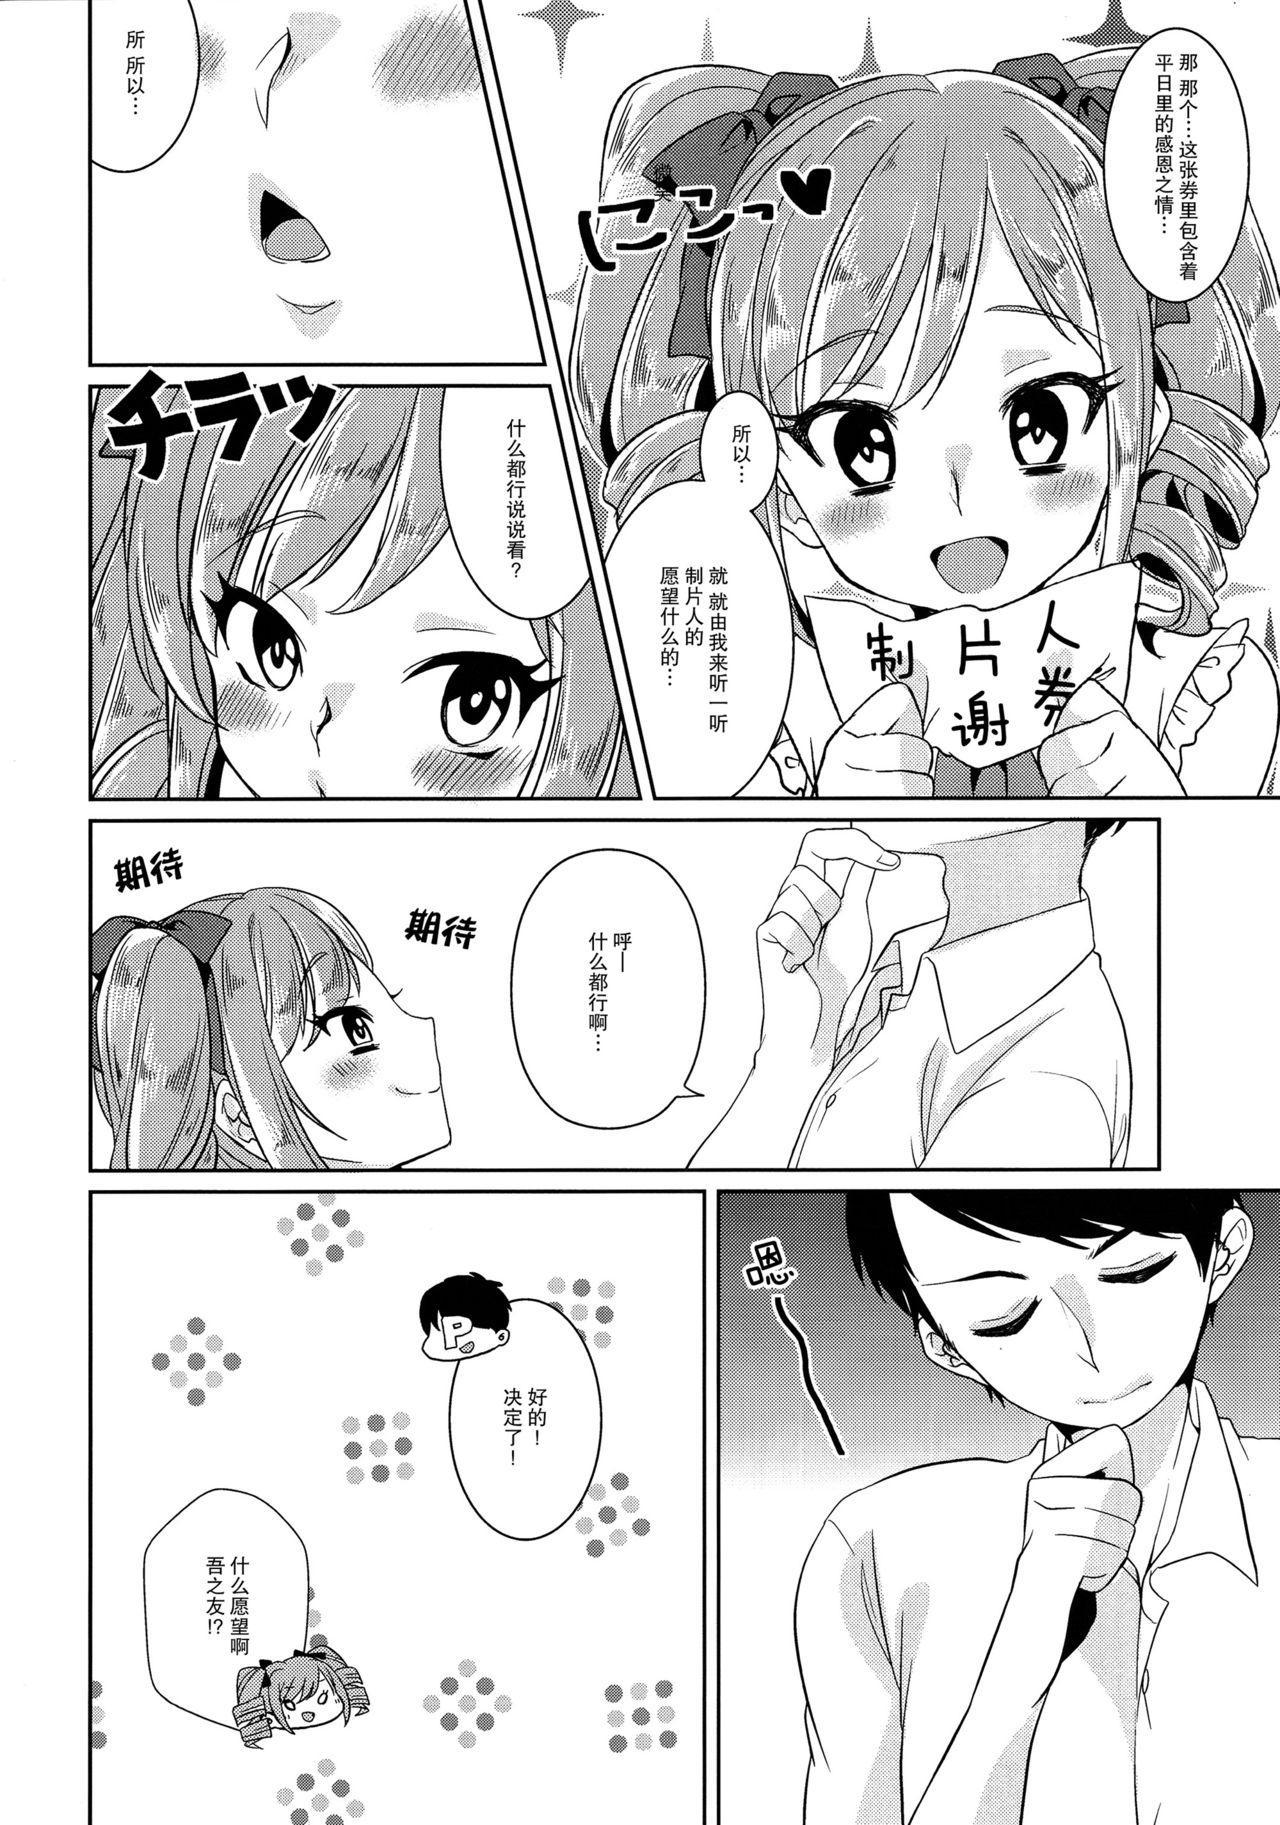 Torokeru Mahou - Melting Magic 97